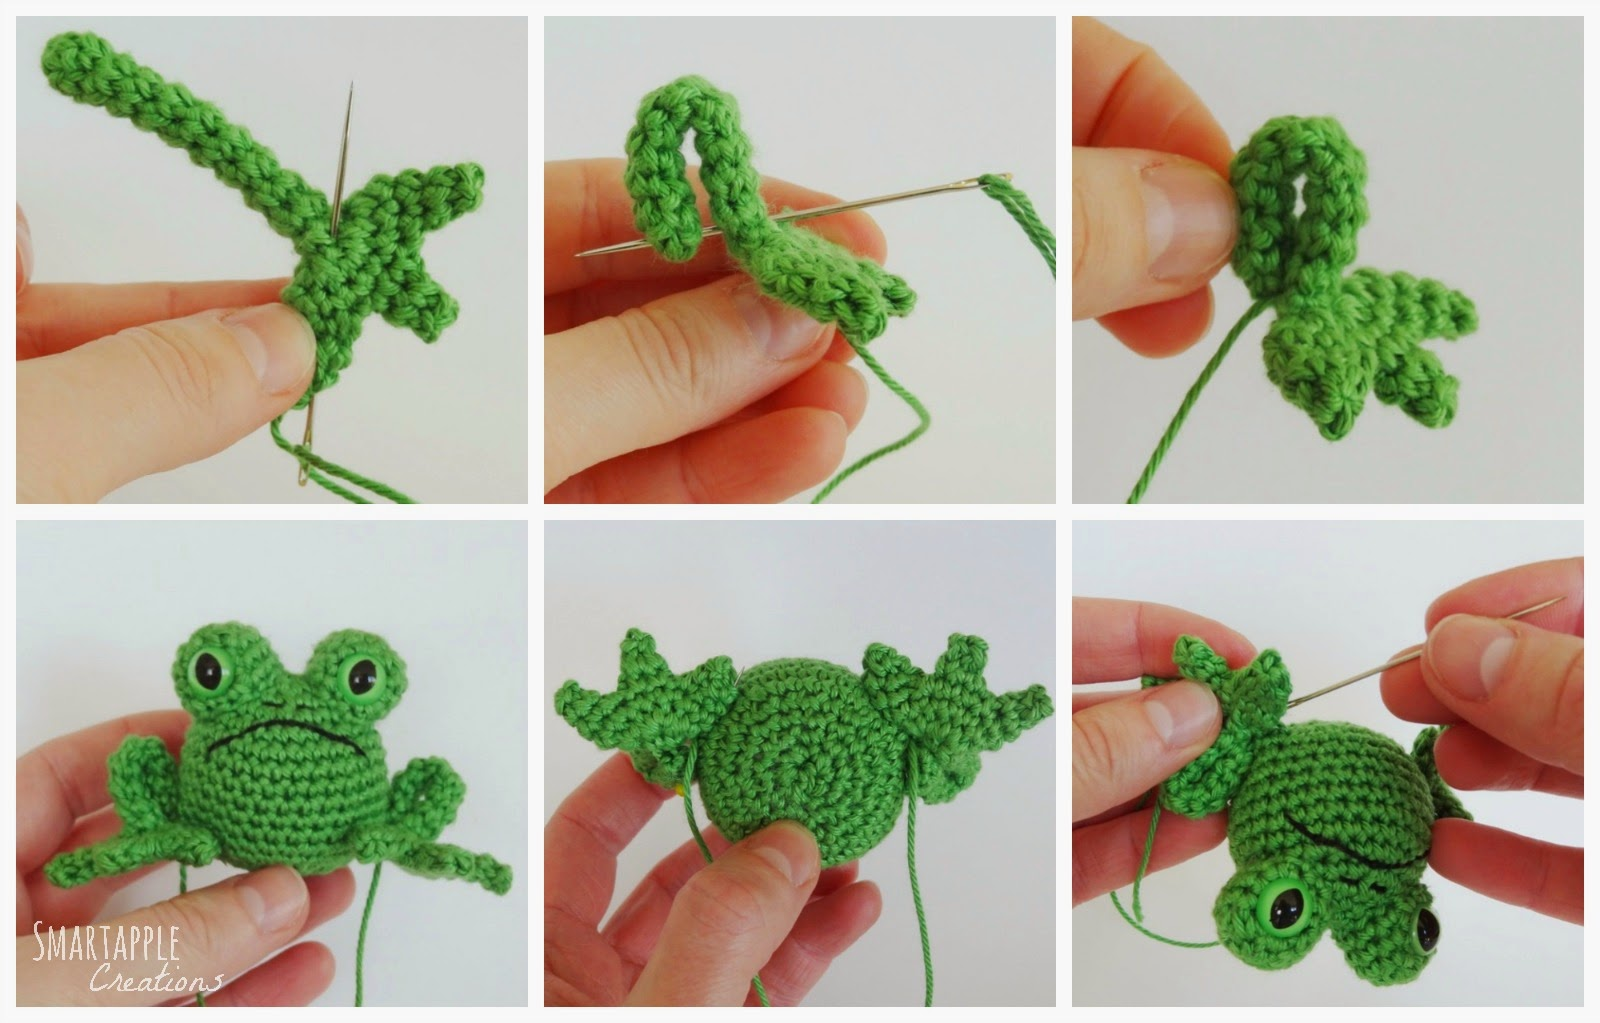 Amigurumi Crochet Frog : Smartapple Creations - amigurumi and crochet: Free pattern ...